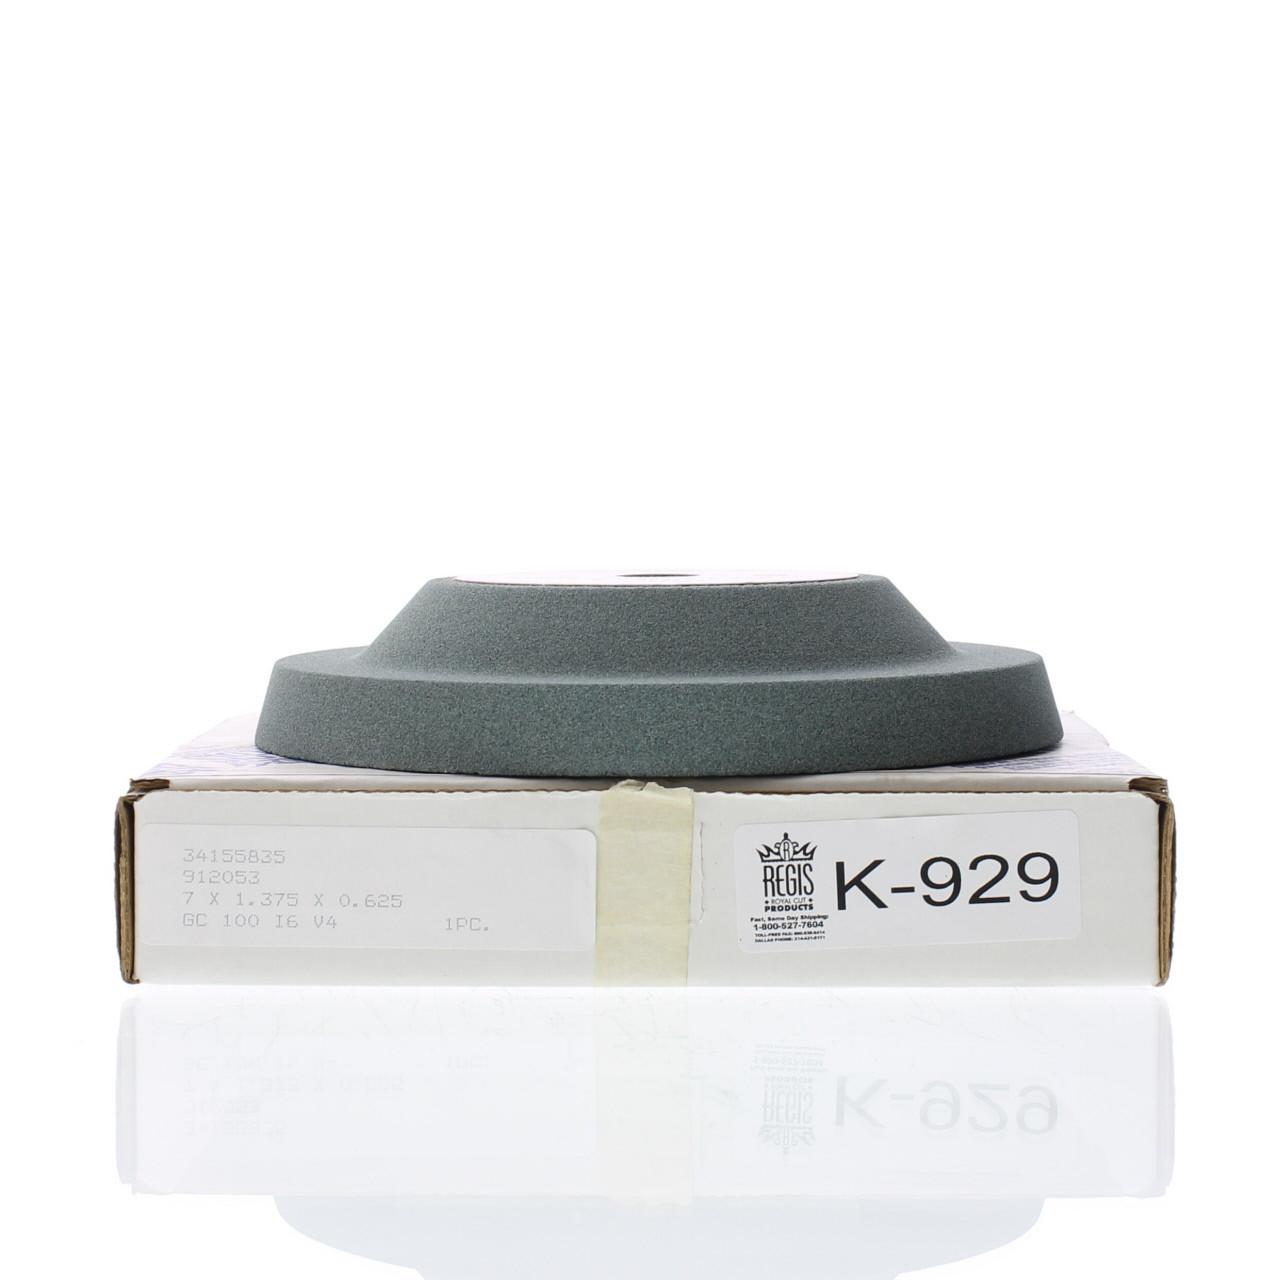 215mm X 35mm 76mm Flare Titanium Valve Refacer Wheel K 821 Mtd Wiring Diagram 929 1072 7 1 3 8 5 Offset 100 Grit